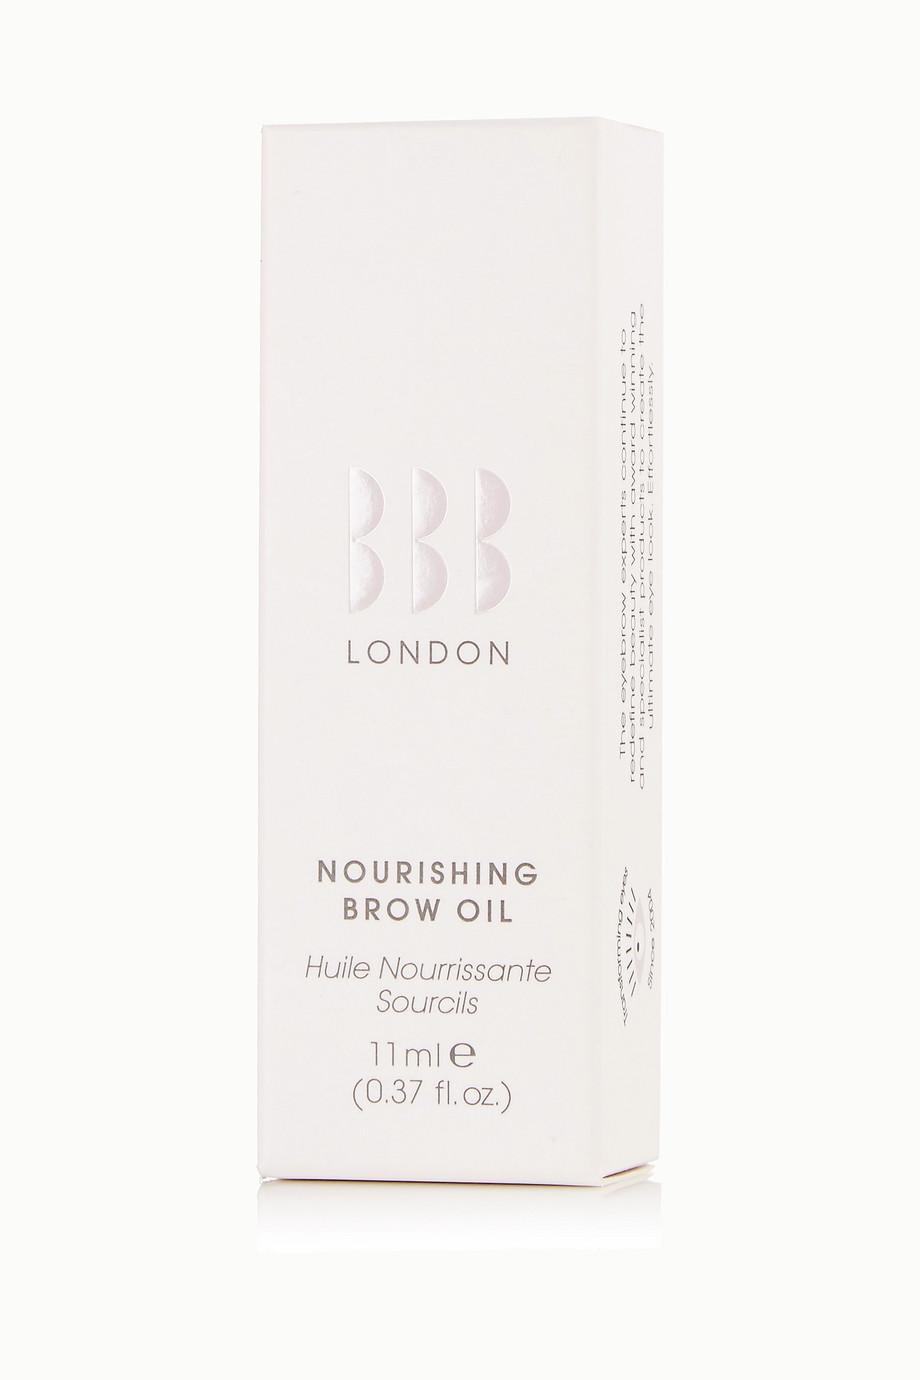 BBB London Nourishing Brow Oil, 11ml